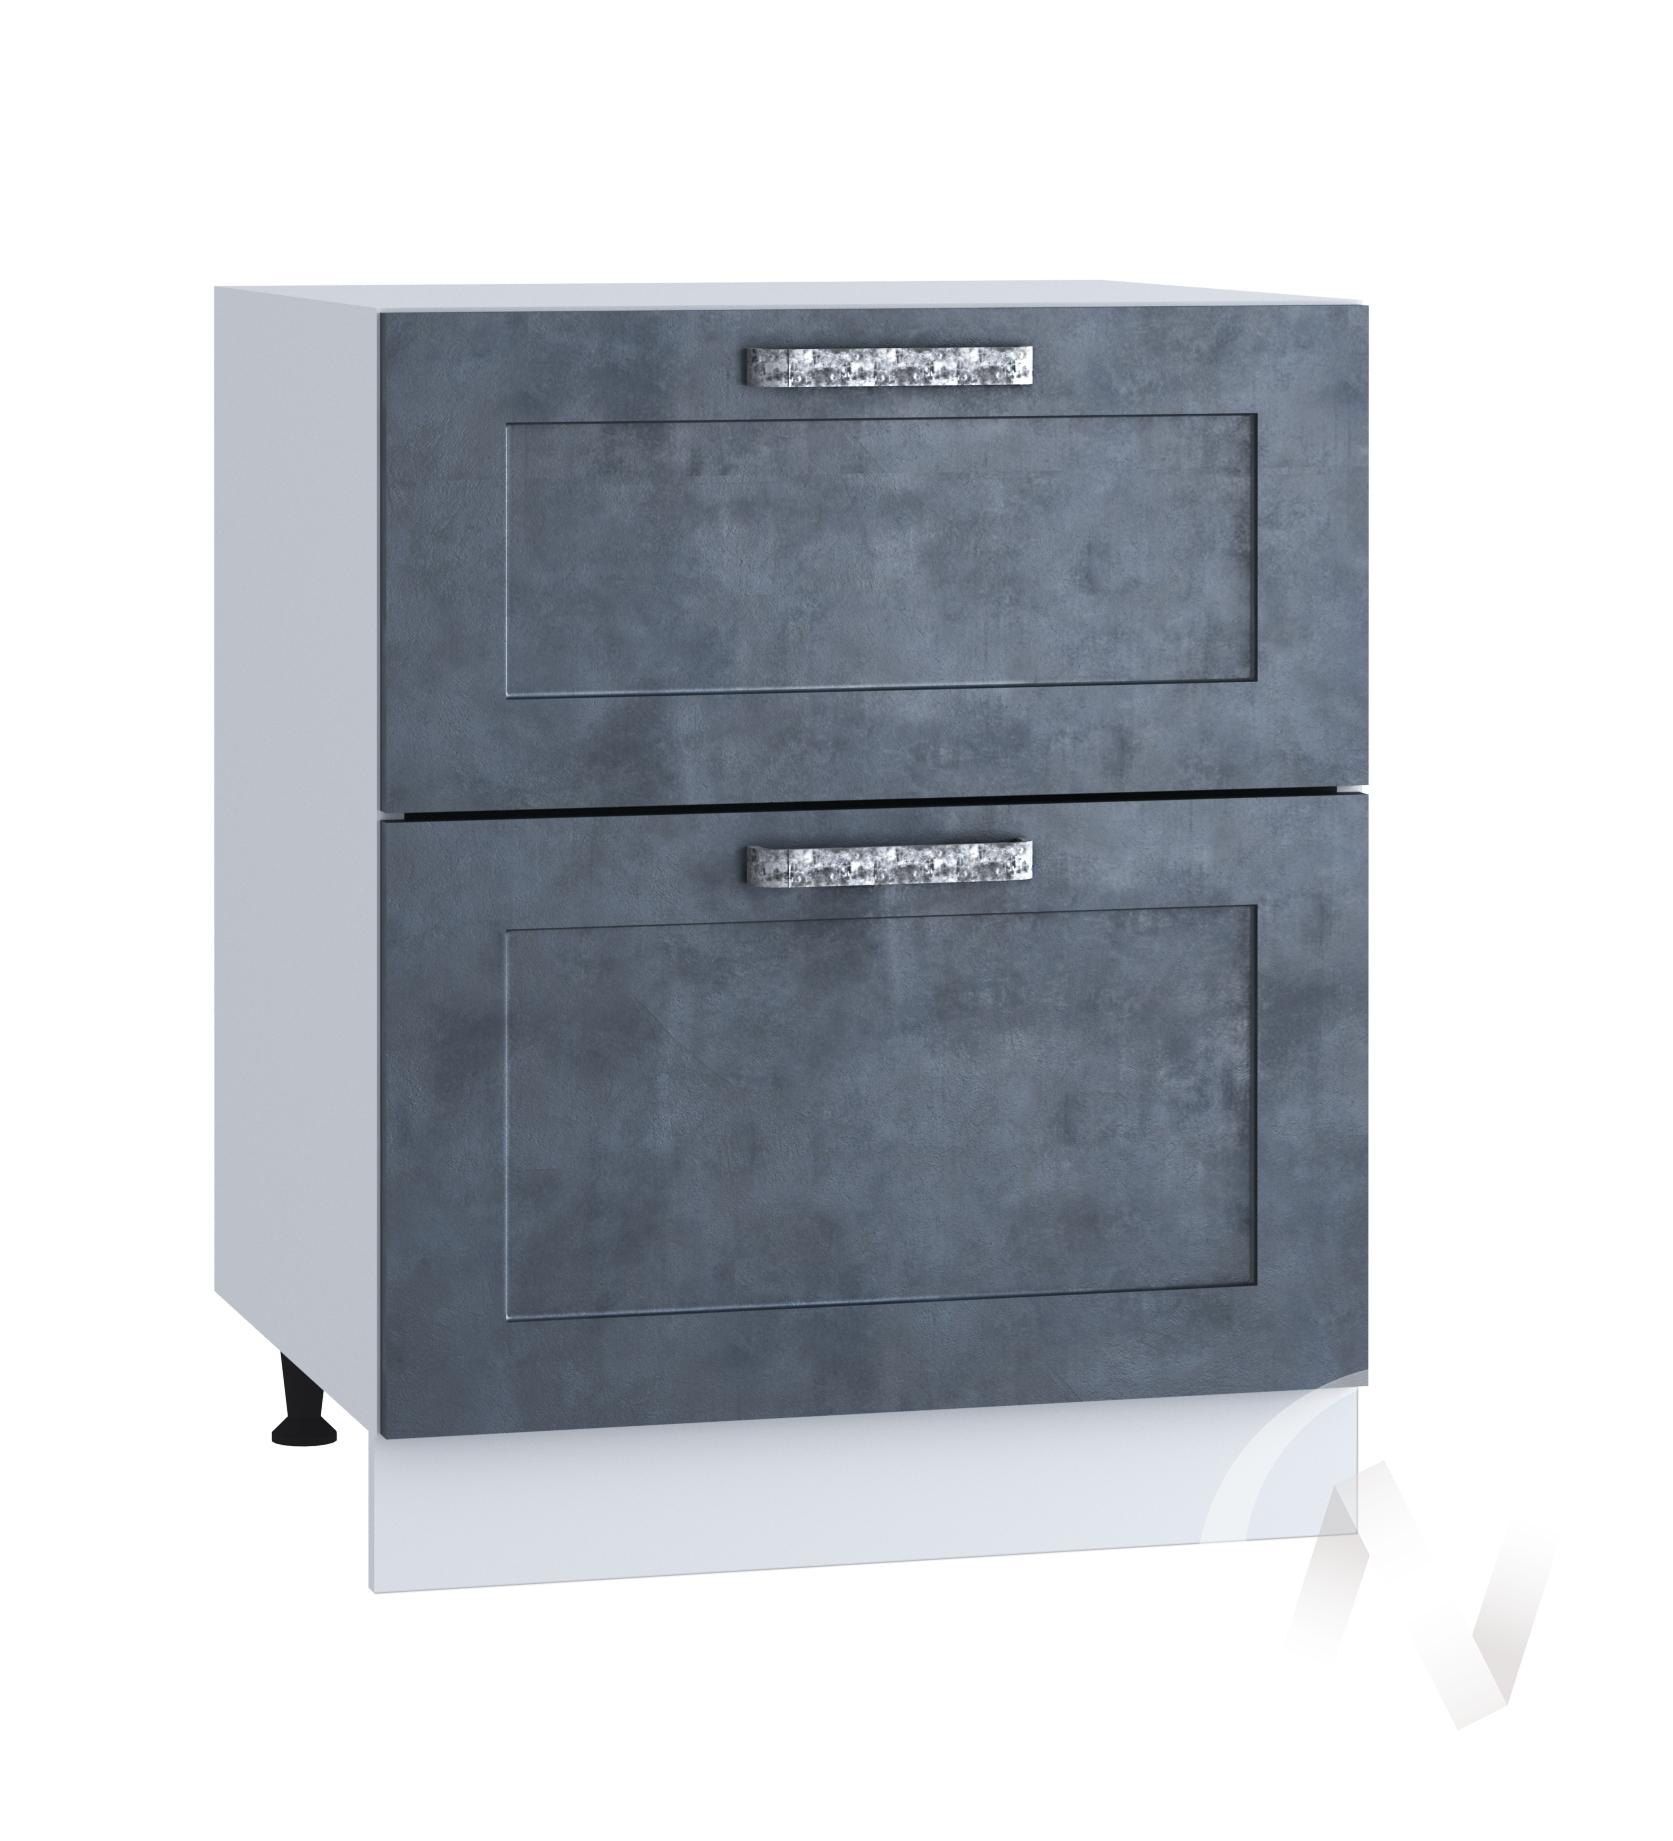 "Кухня ""Лофт"": Шкаф нижний с 2-мя ящиками 600, ШН2Я 600 (Бетон графит/корпус белый)"